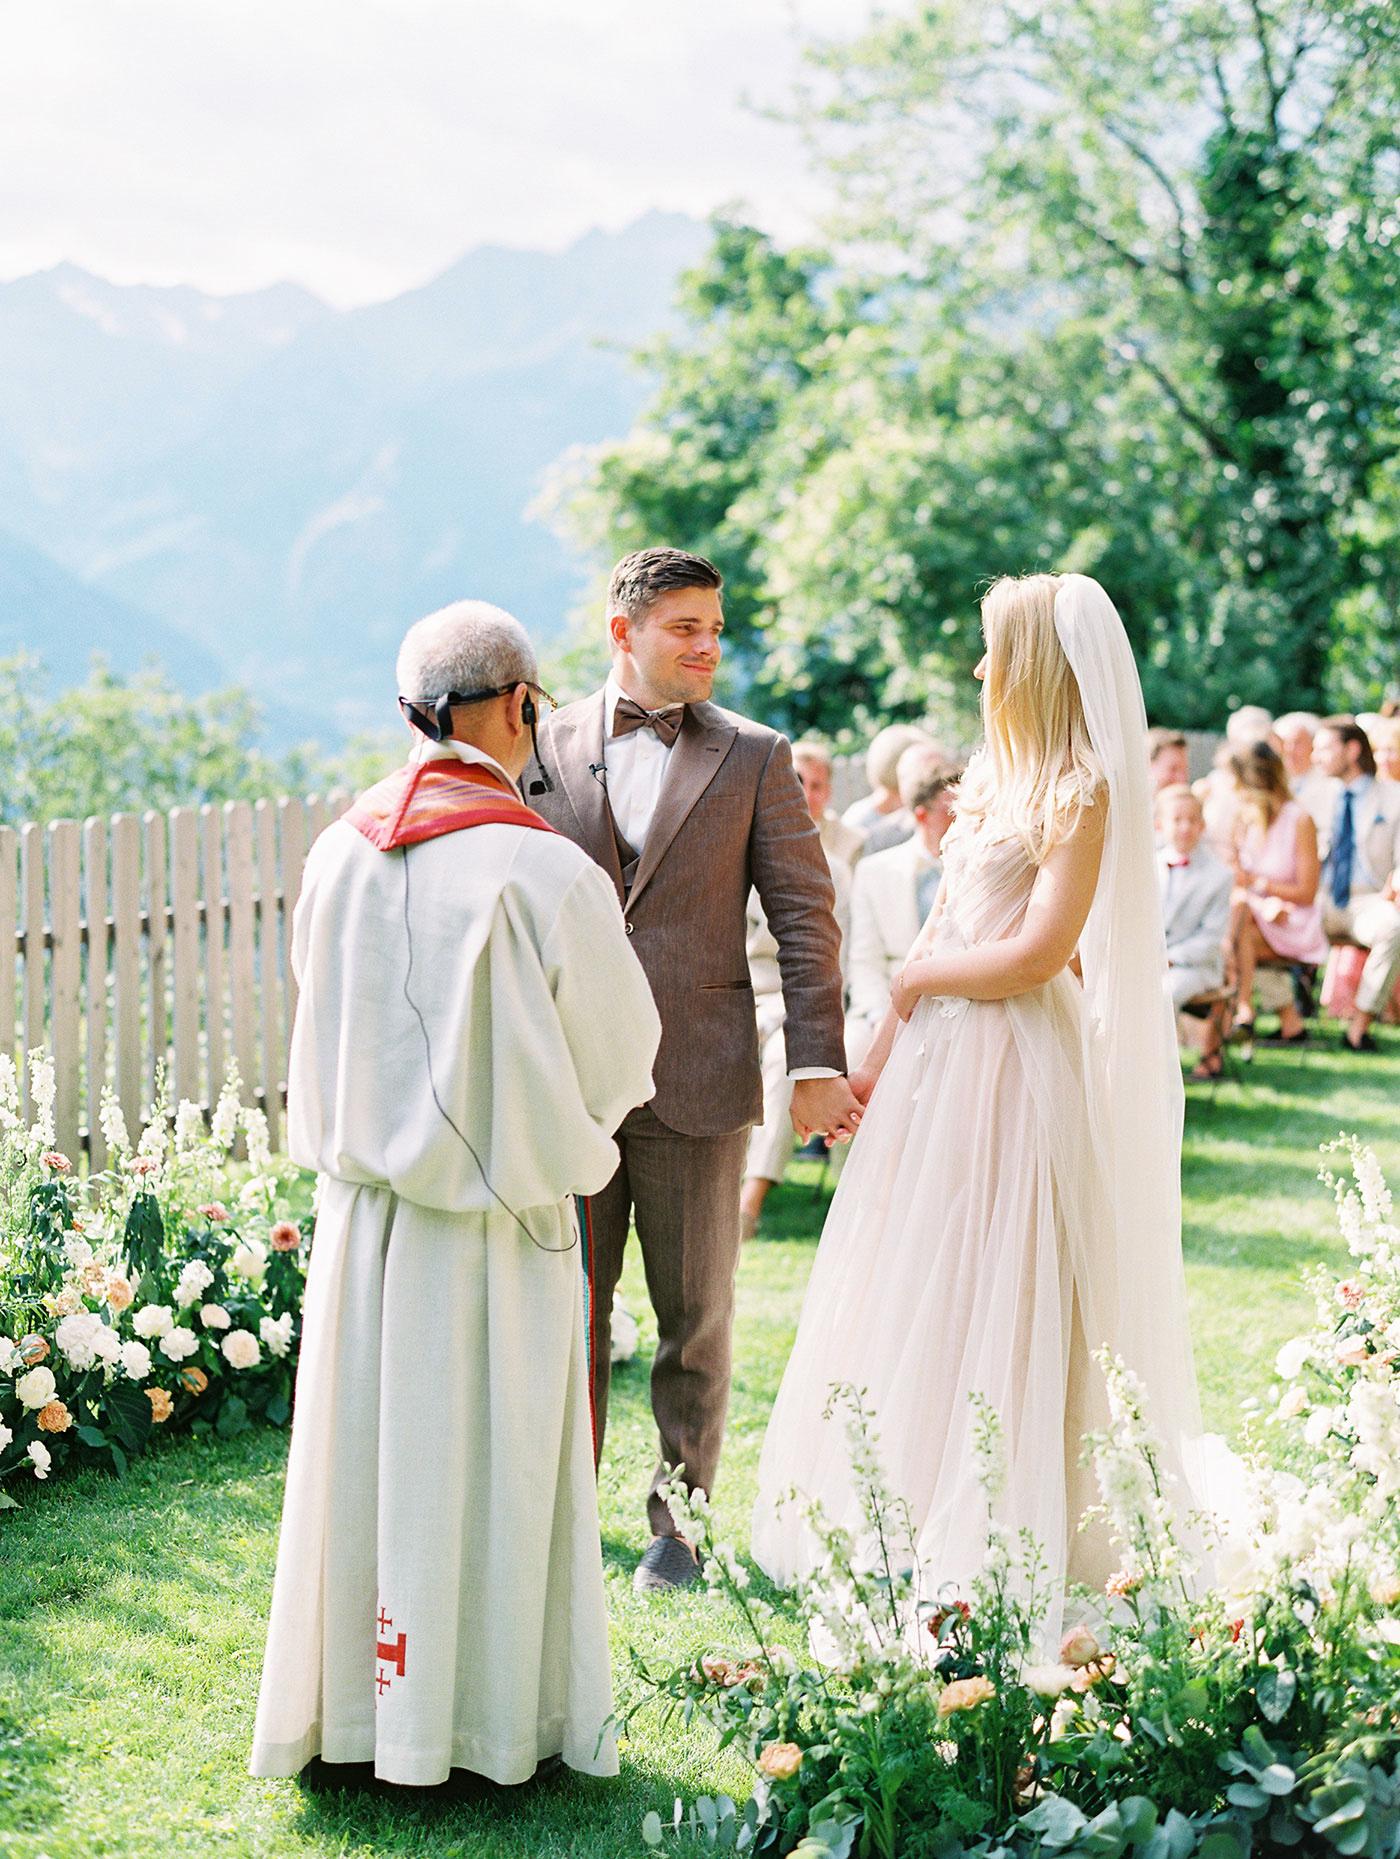 julia franz wedding ceremony couple officiant